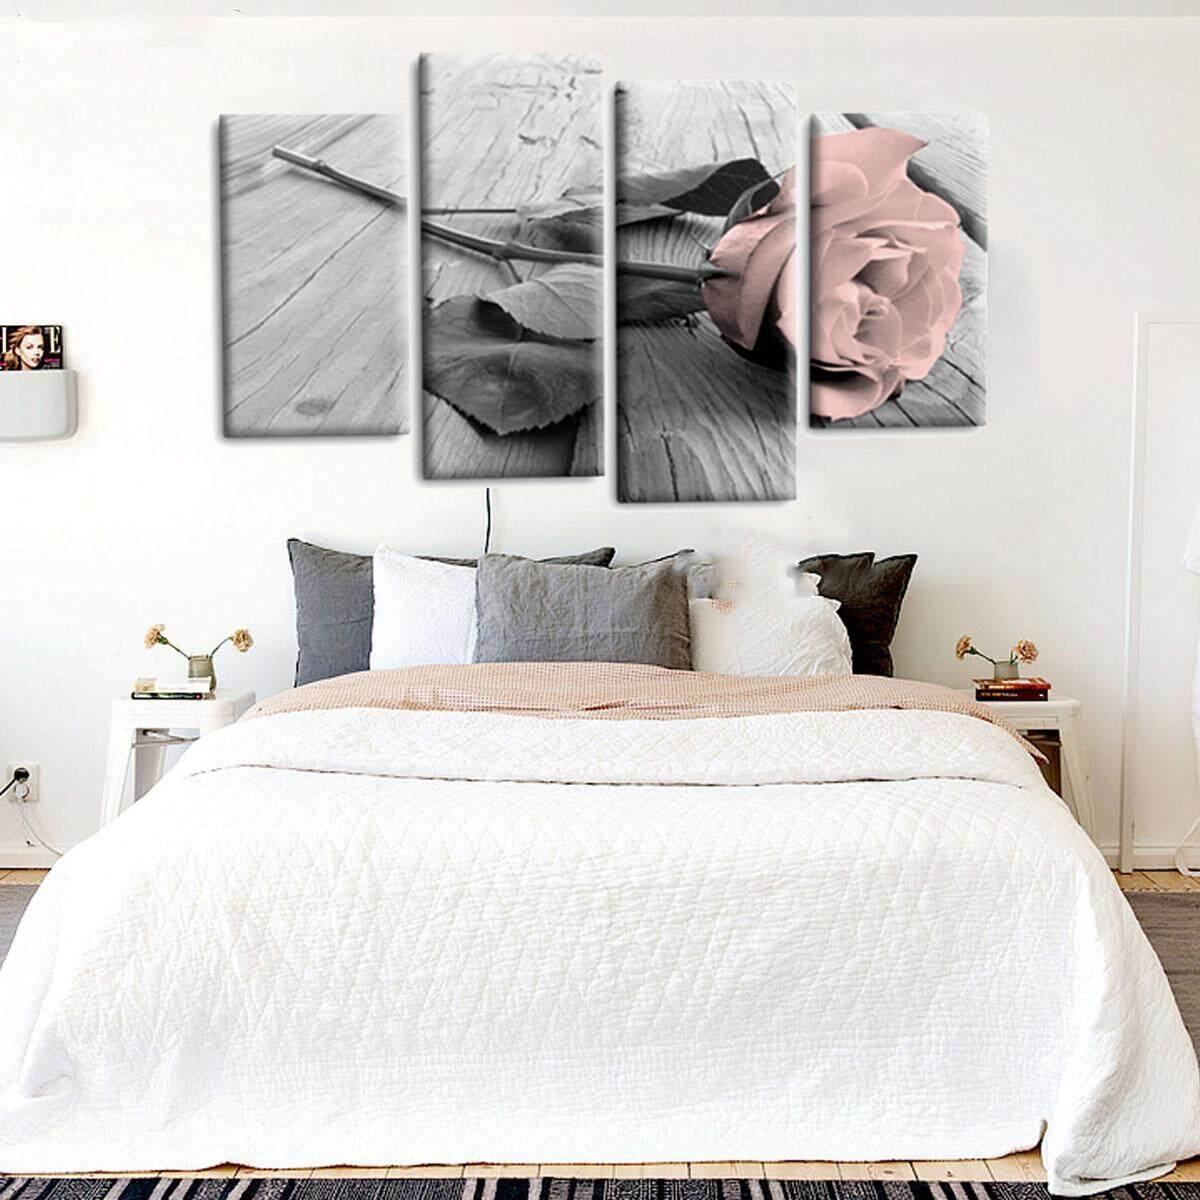 ... 4 Pcs Bunga Mawar Lukisan Kanvas Pemandangan Seni Dinding Cetak Gambar Dekorasi Tanpa Bingkai-Internasional